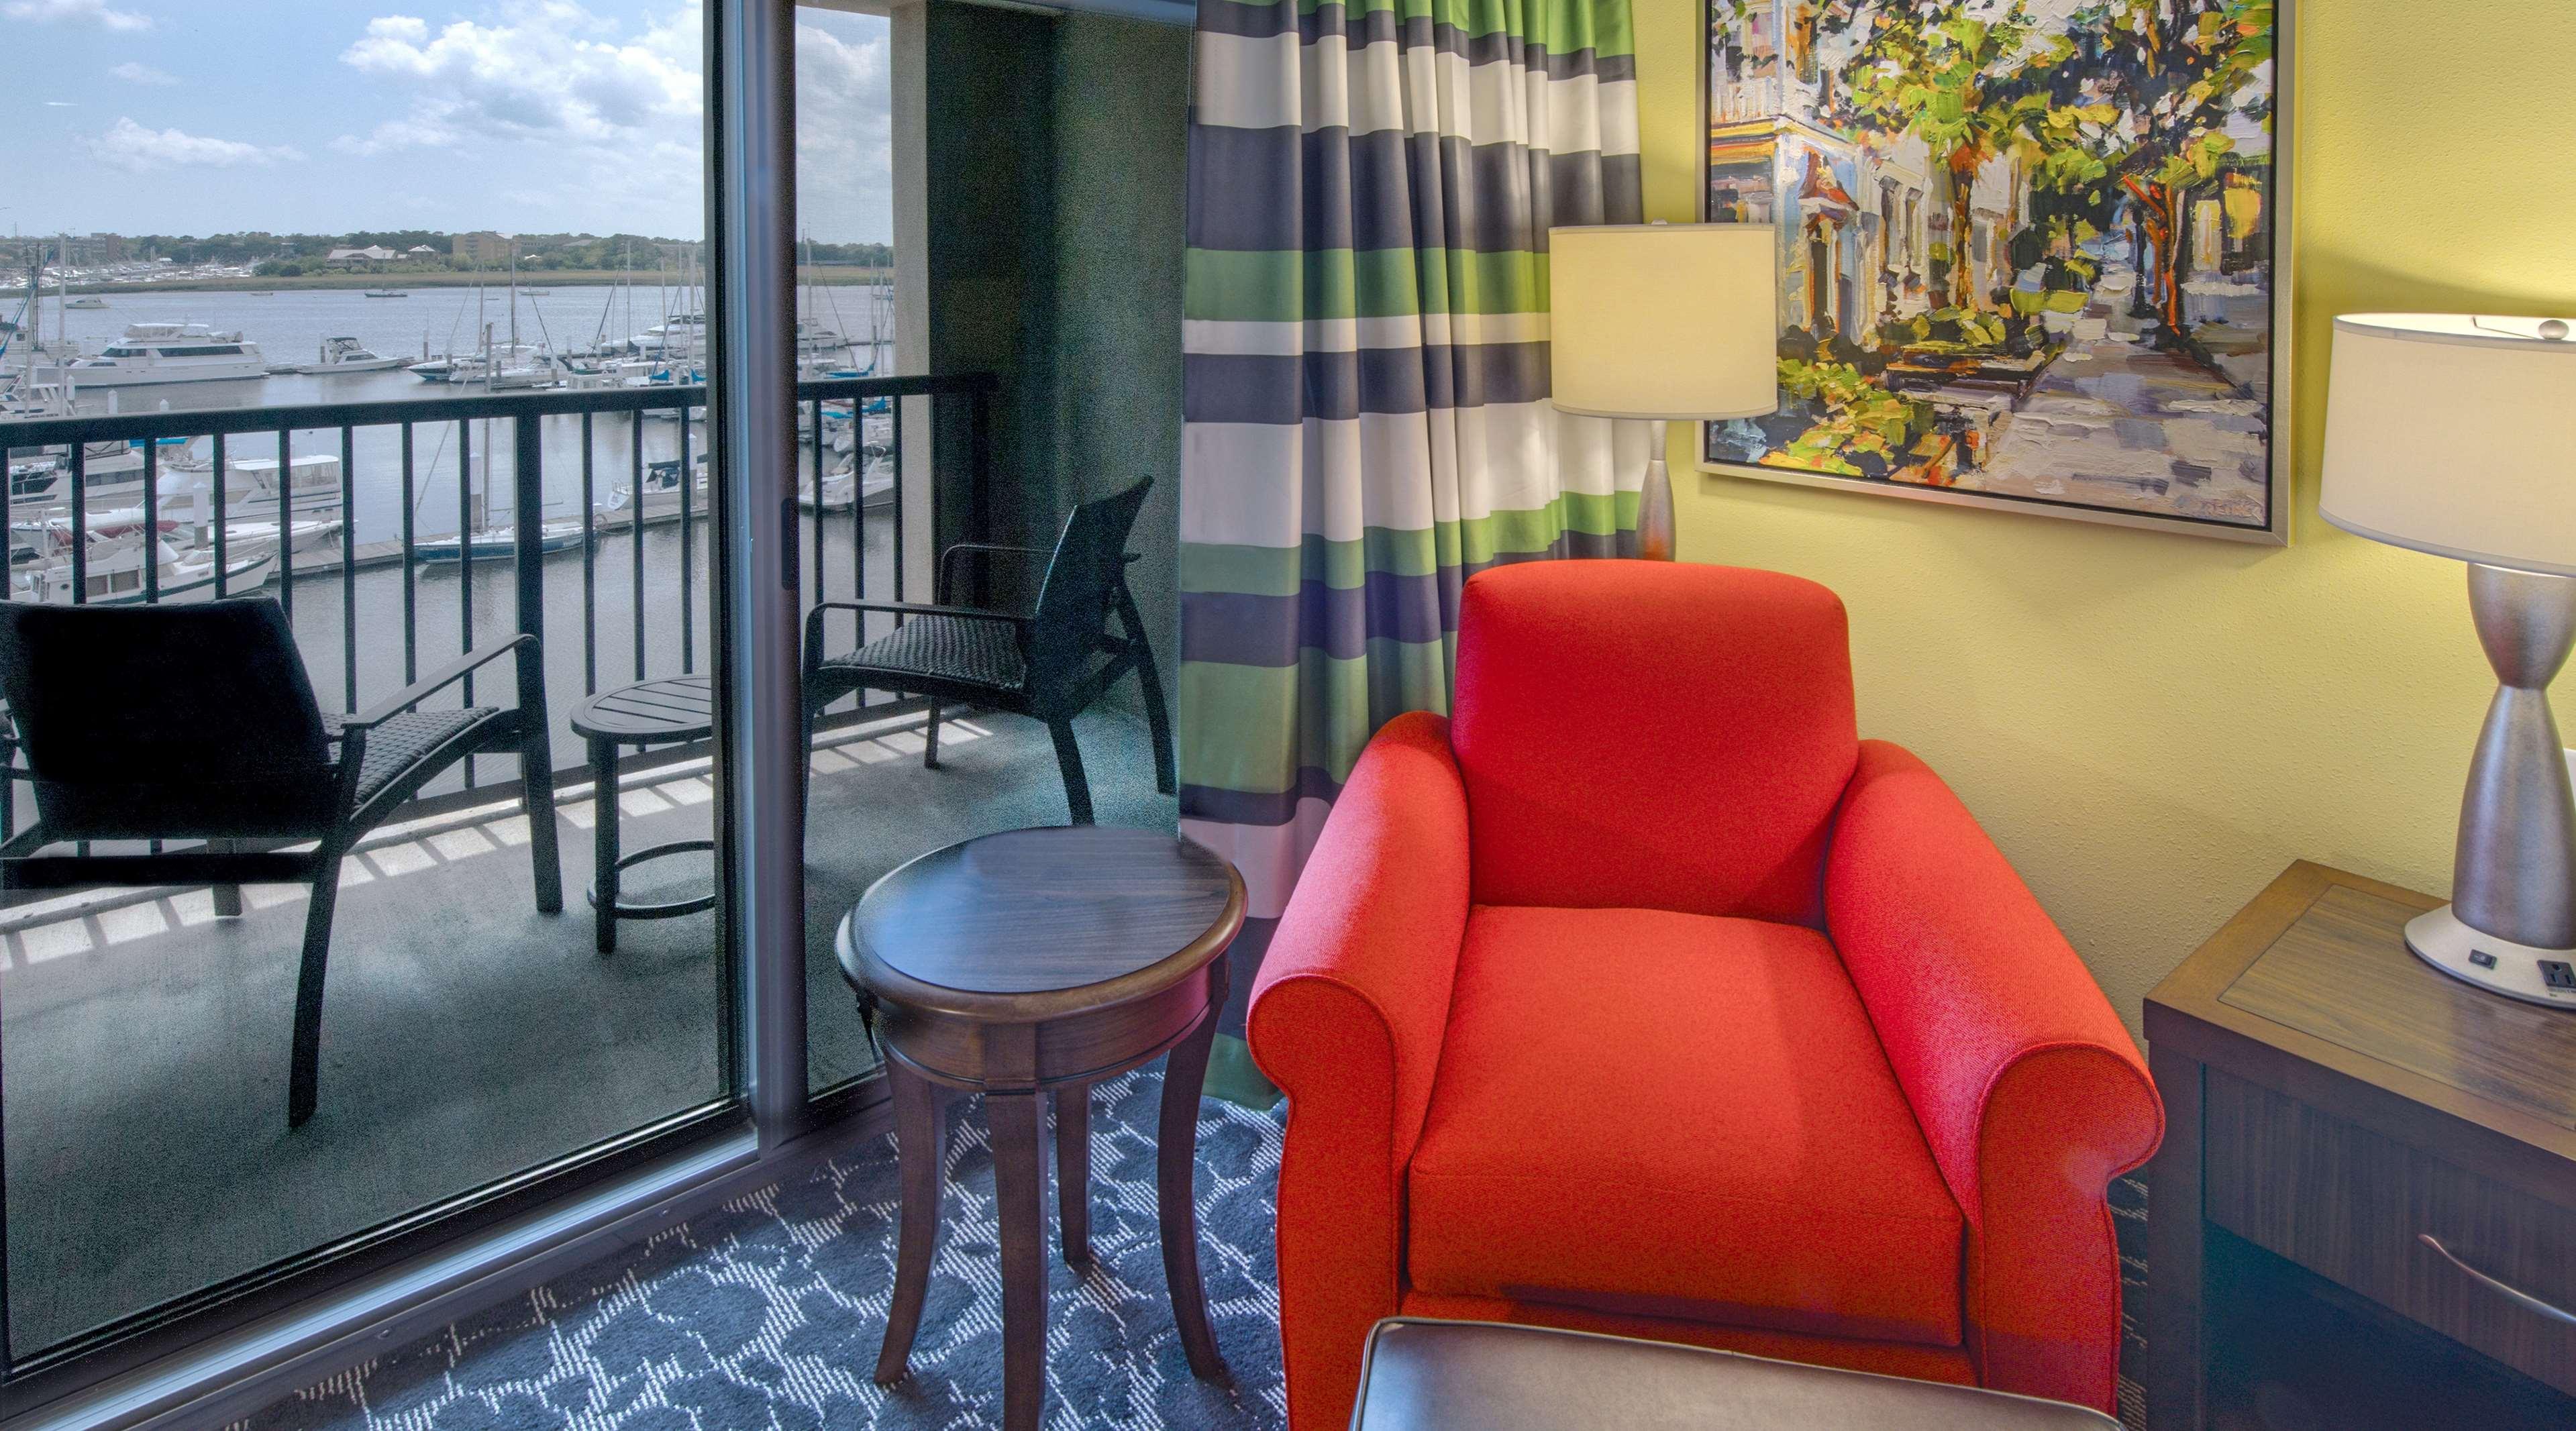 Hilton Garden Inn Charleston Waterfront/Downtown image 14